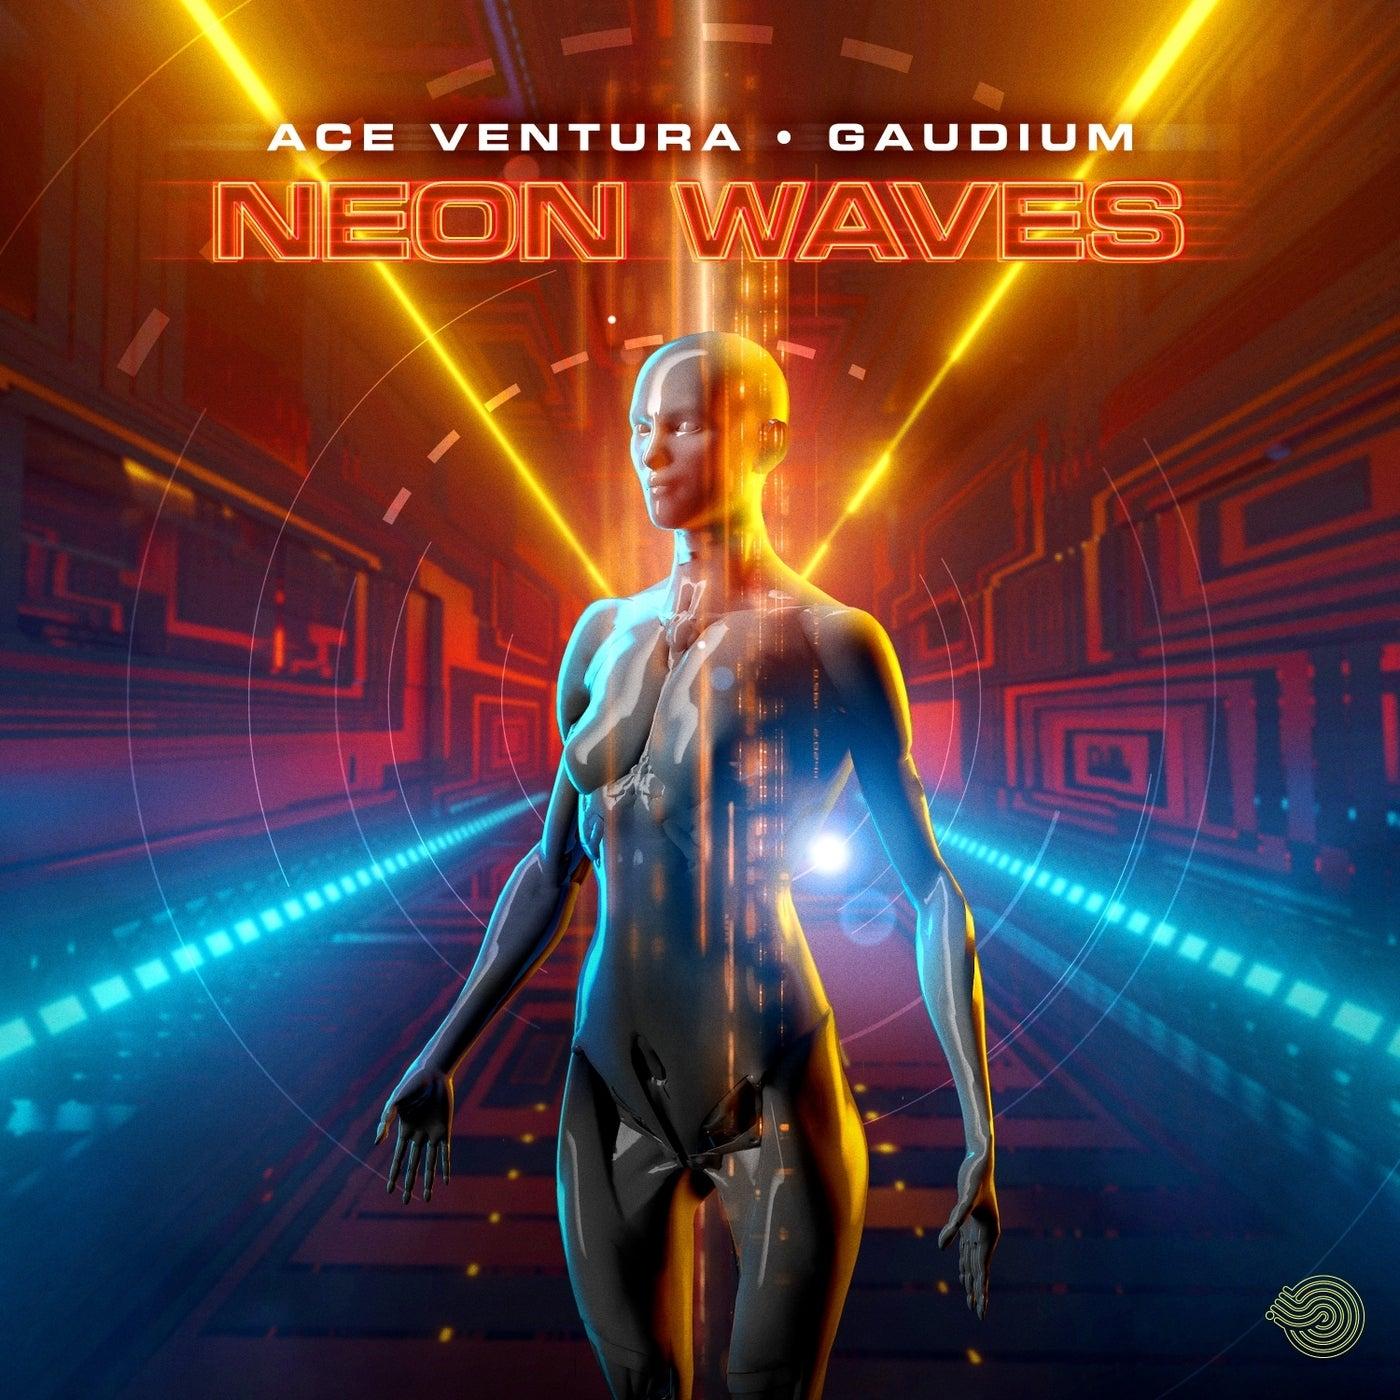 Neon Waves (Original mix)